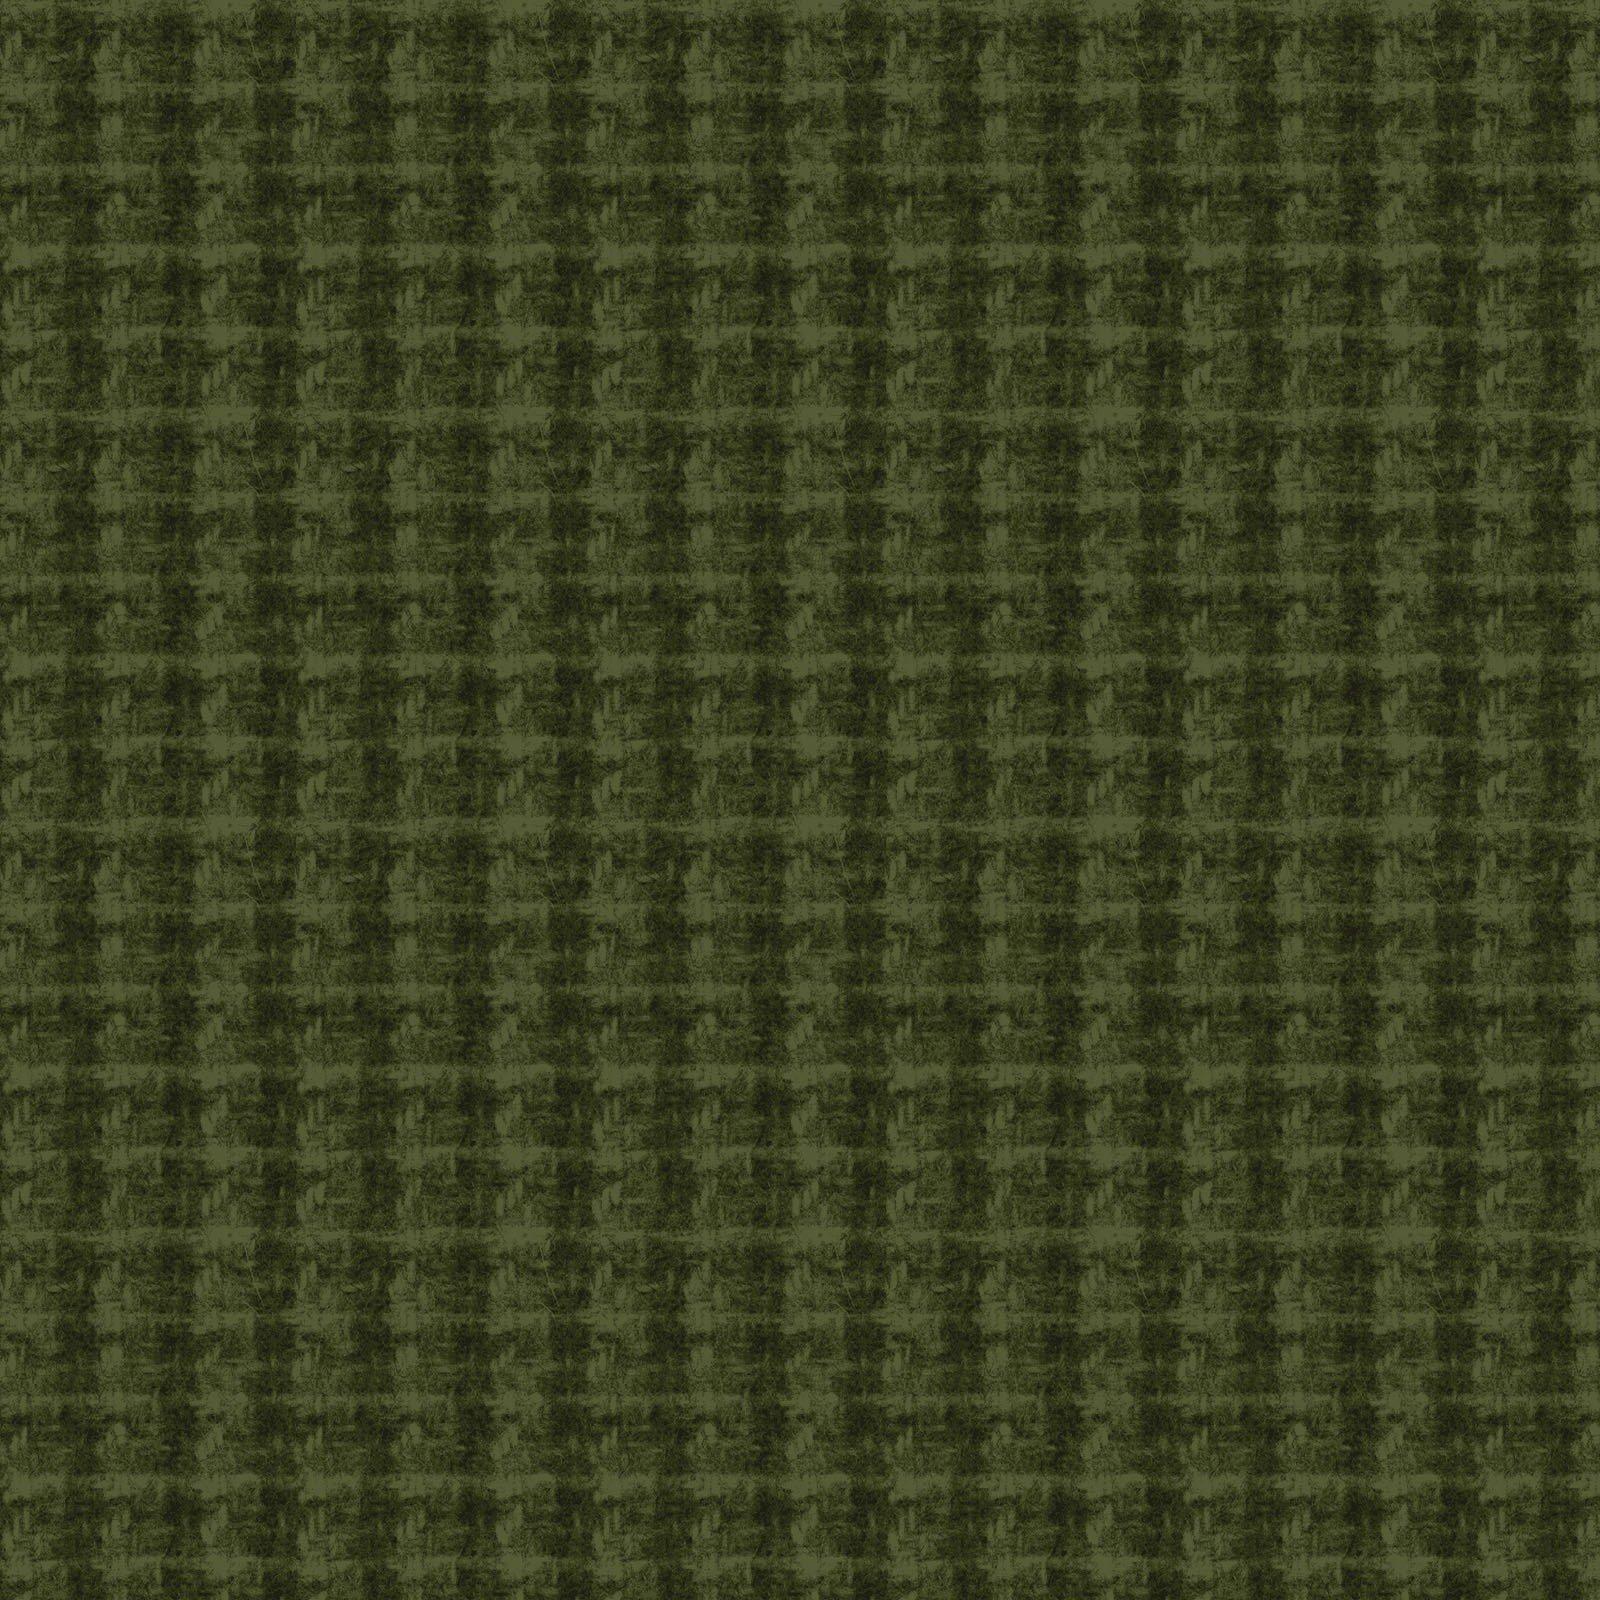 Woolies Flannel Double Weave Dark Green (MASF18504-G2)